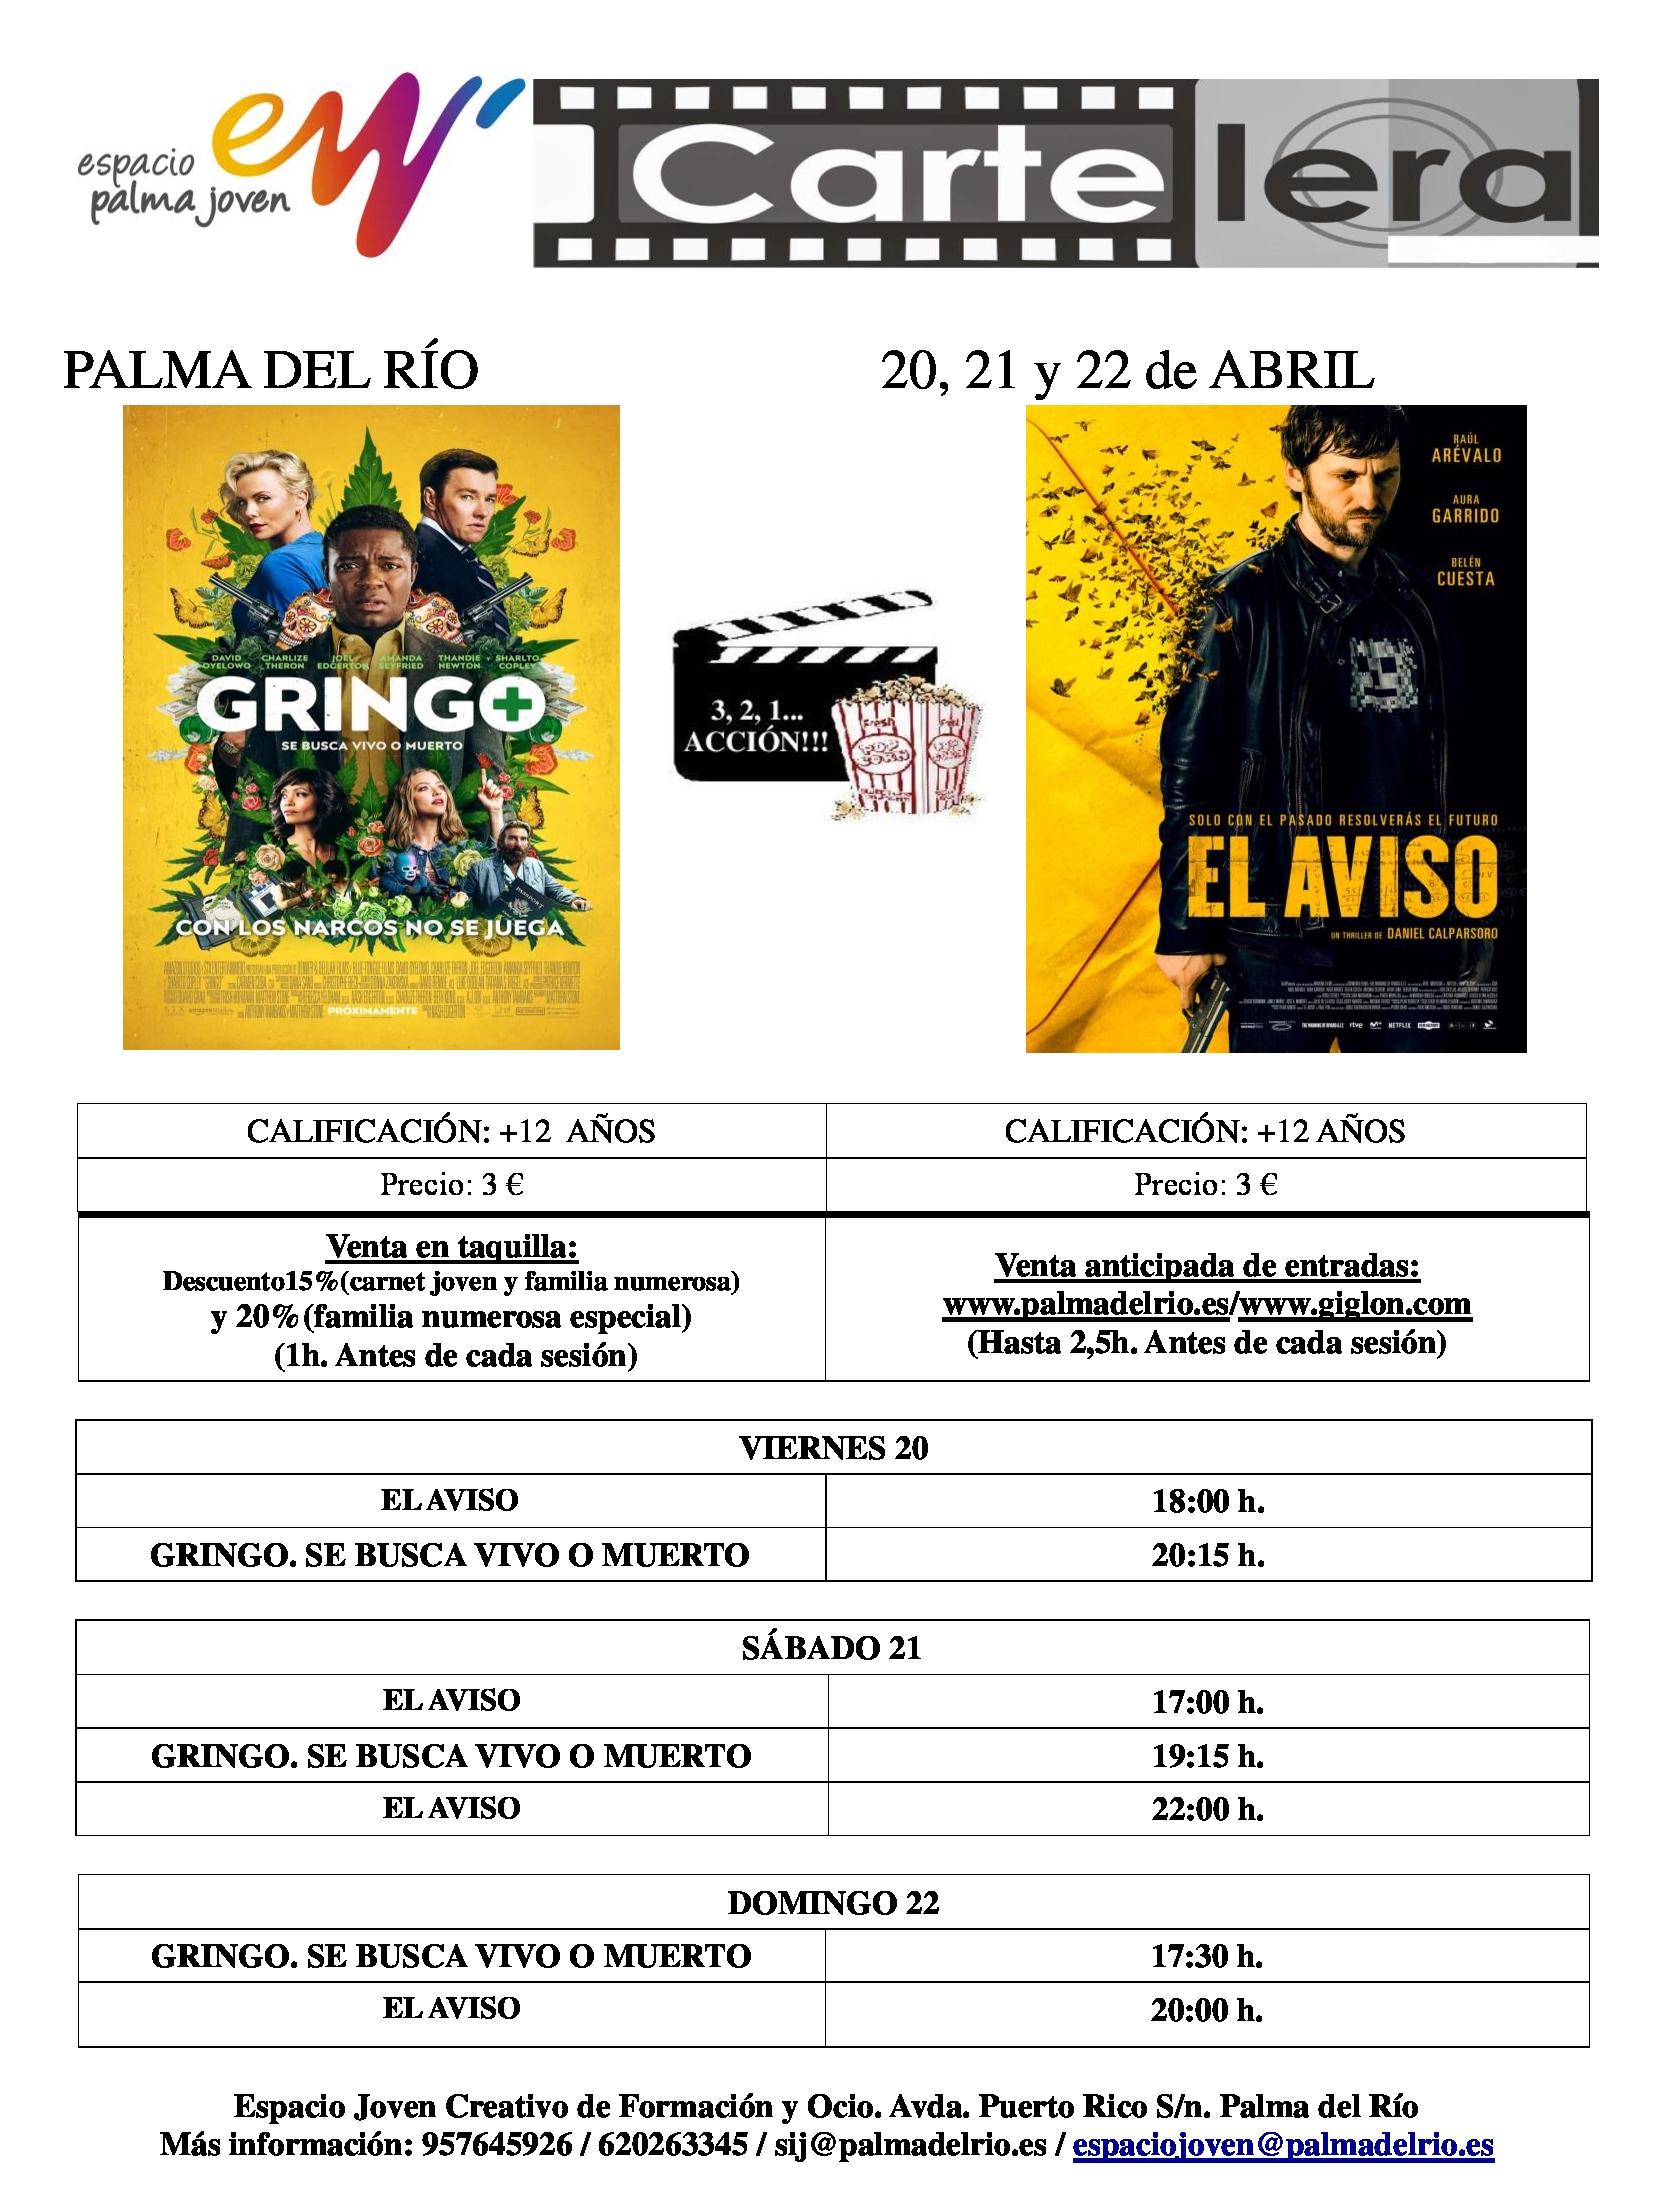 https://www.palmadelrio.es/sites/default/files/cartelera_1.jpg